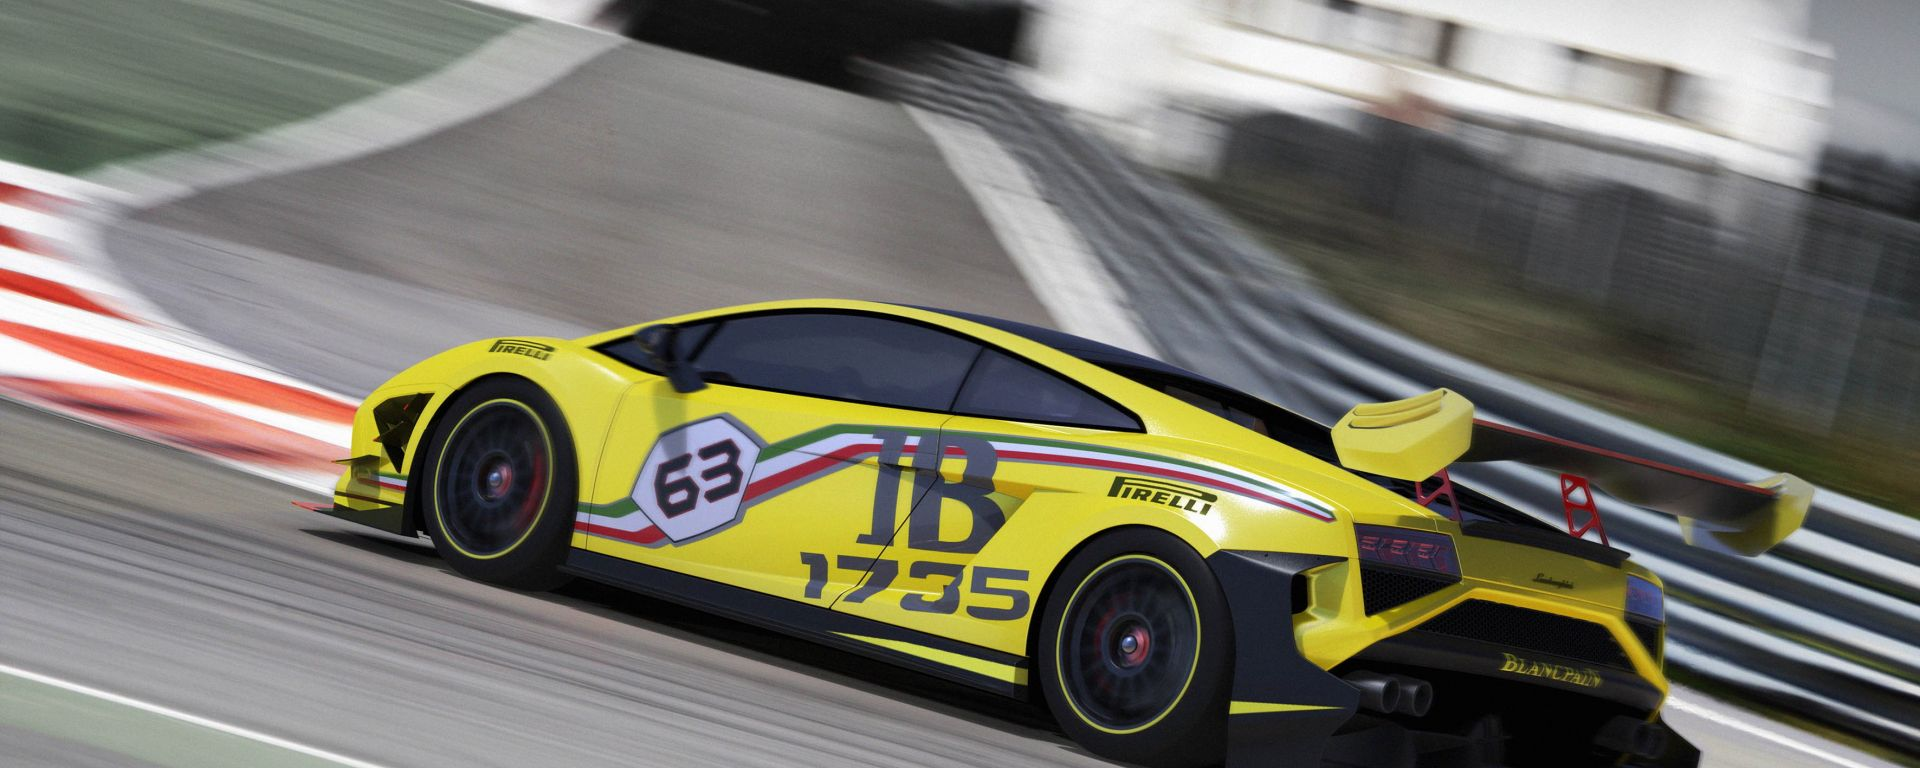 Lamborghini Gallardo LP570-4 Super Trofeo 2013